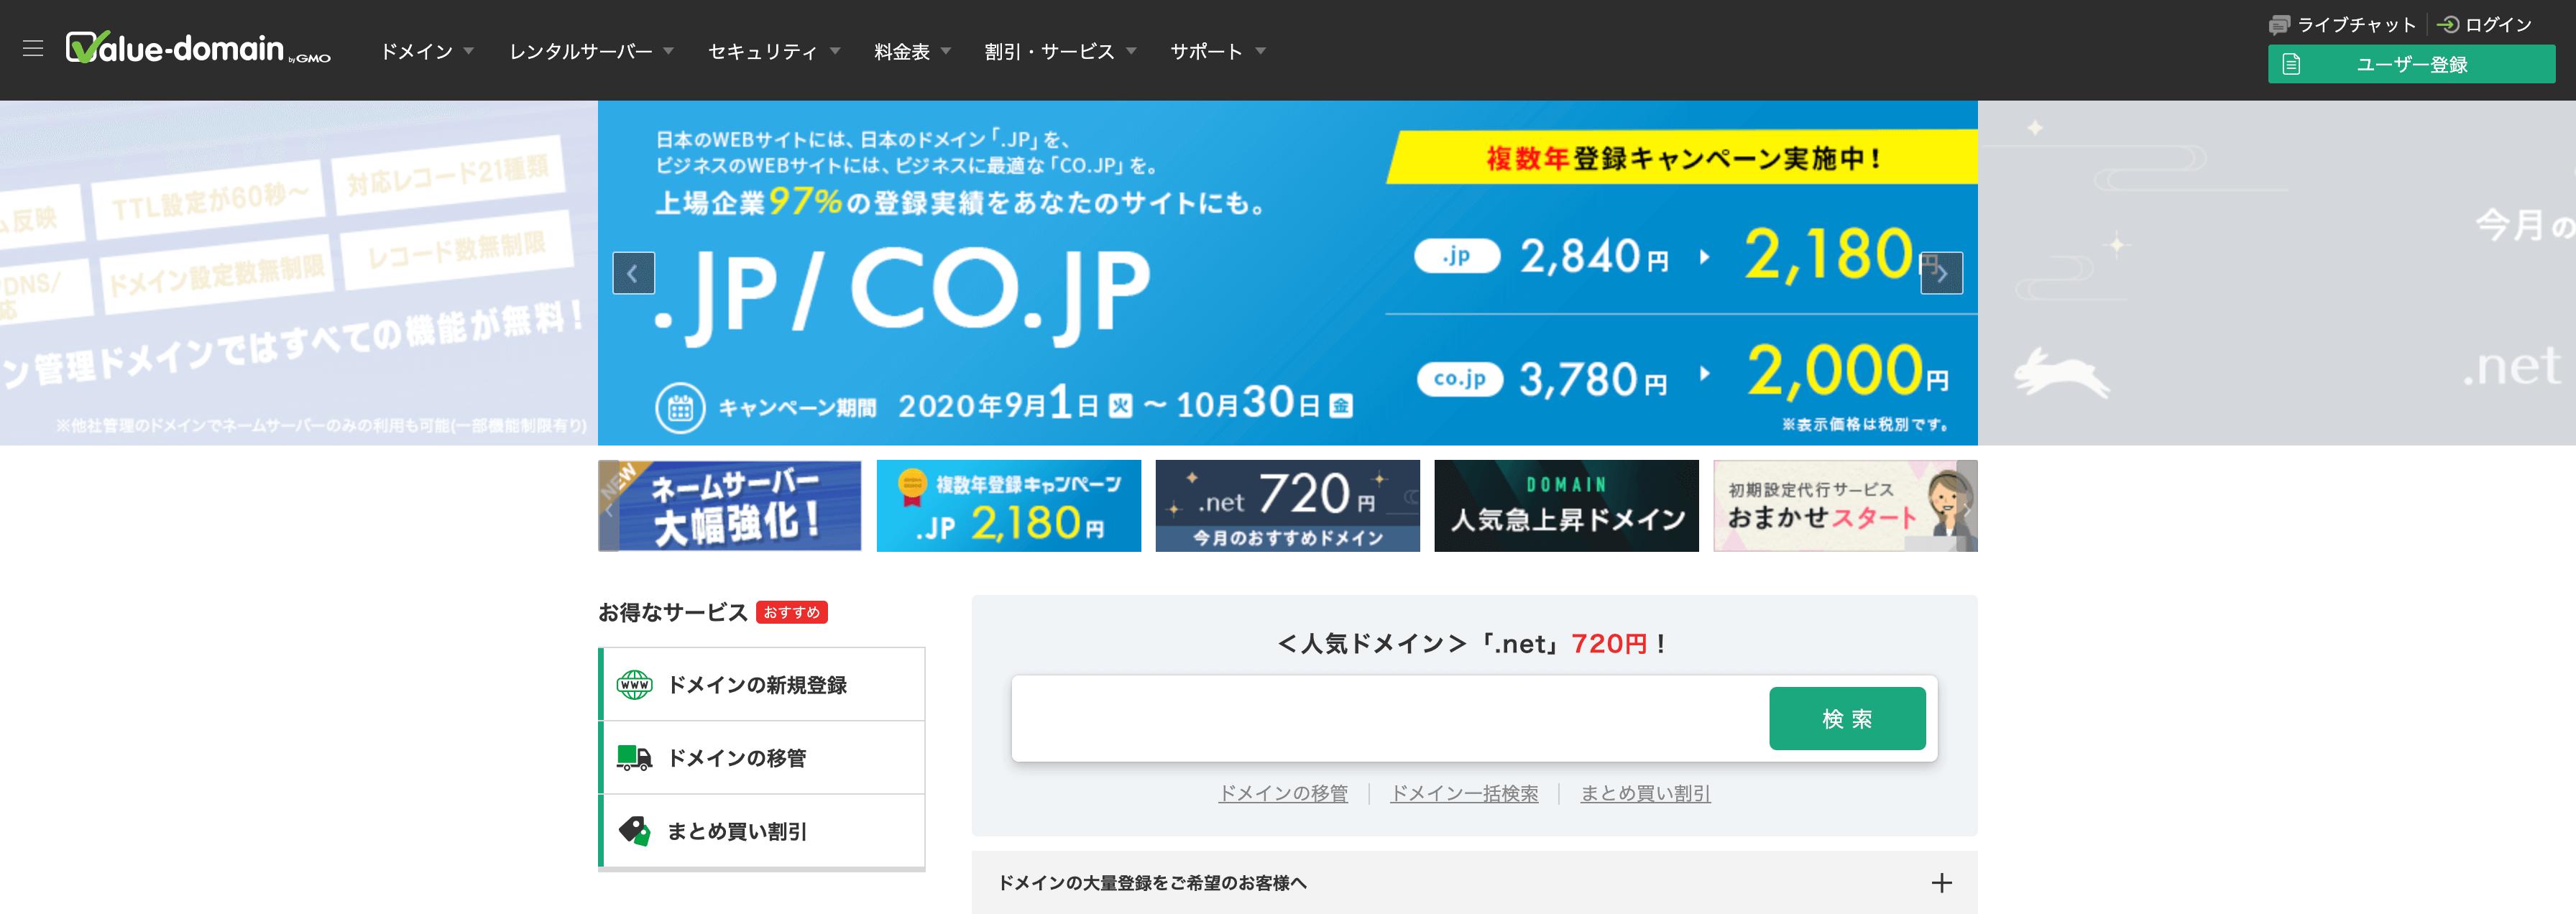 Value-domain(バリュードメイン)